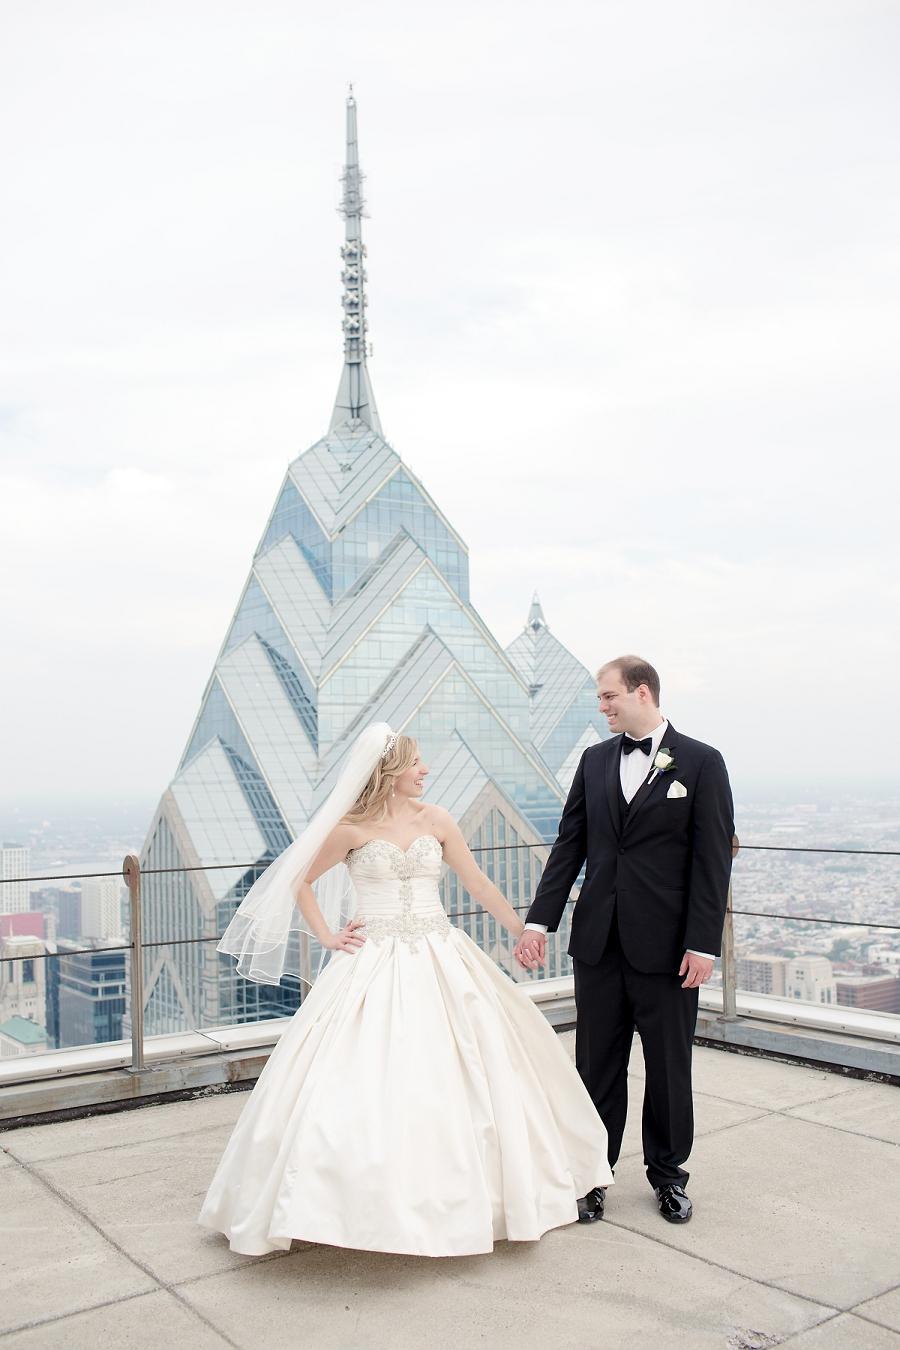 Pyramid-Club-Philadelphia-Wedding-by-Adrienne-Matz-Photography_0089